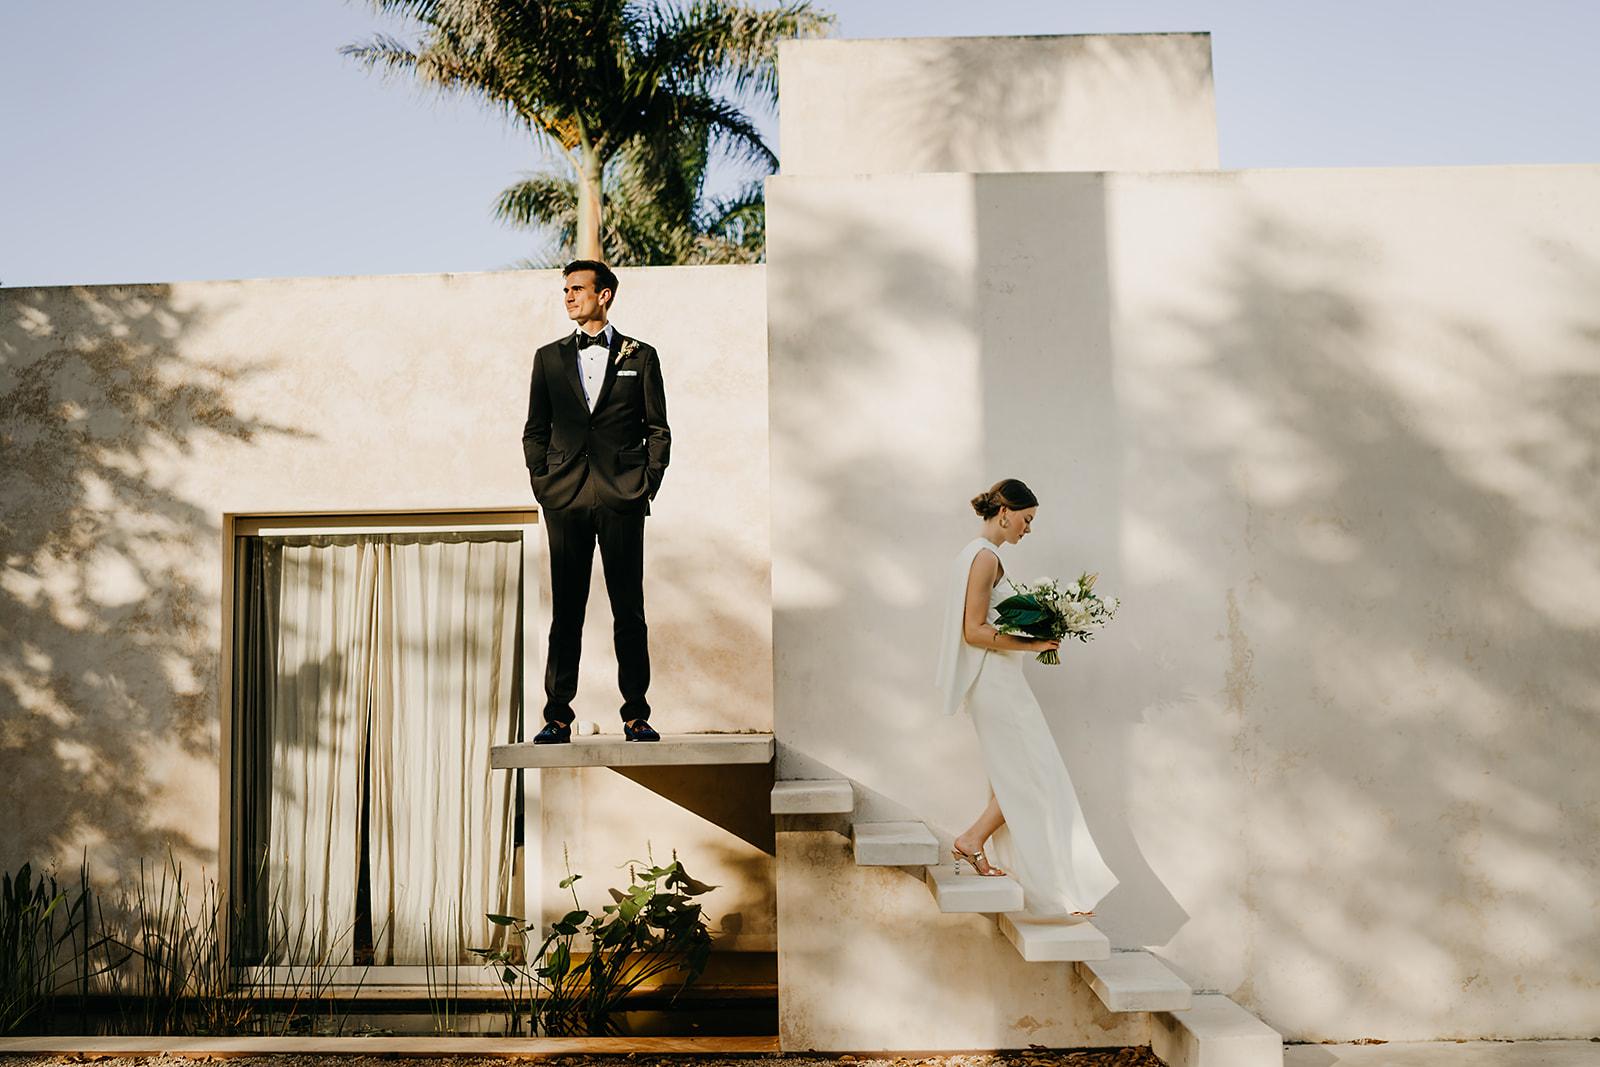 AmandaMarkus-Hacienda-Sac-Chich-Merida-Wedding-365_websize.jpg